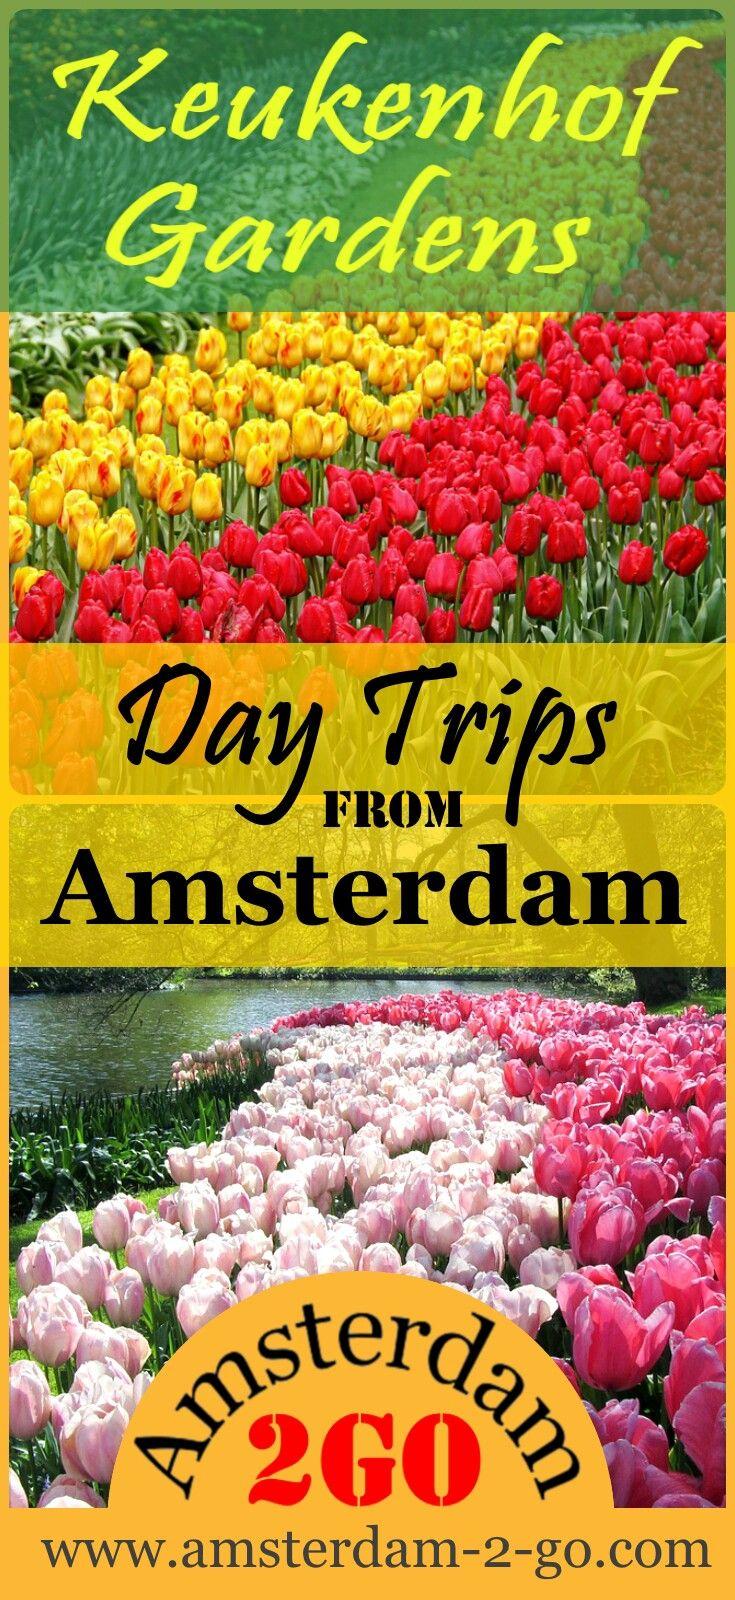 eadda93935d1f592b90633b150080ff4 - Tours From Amsterdam To Keukenhof Gardens